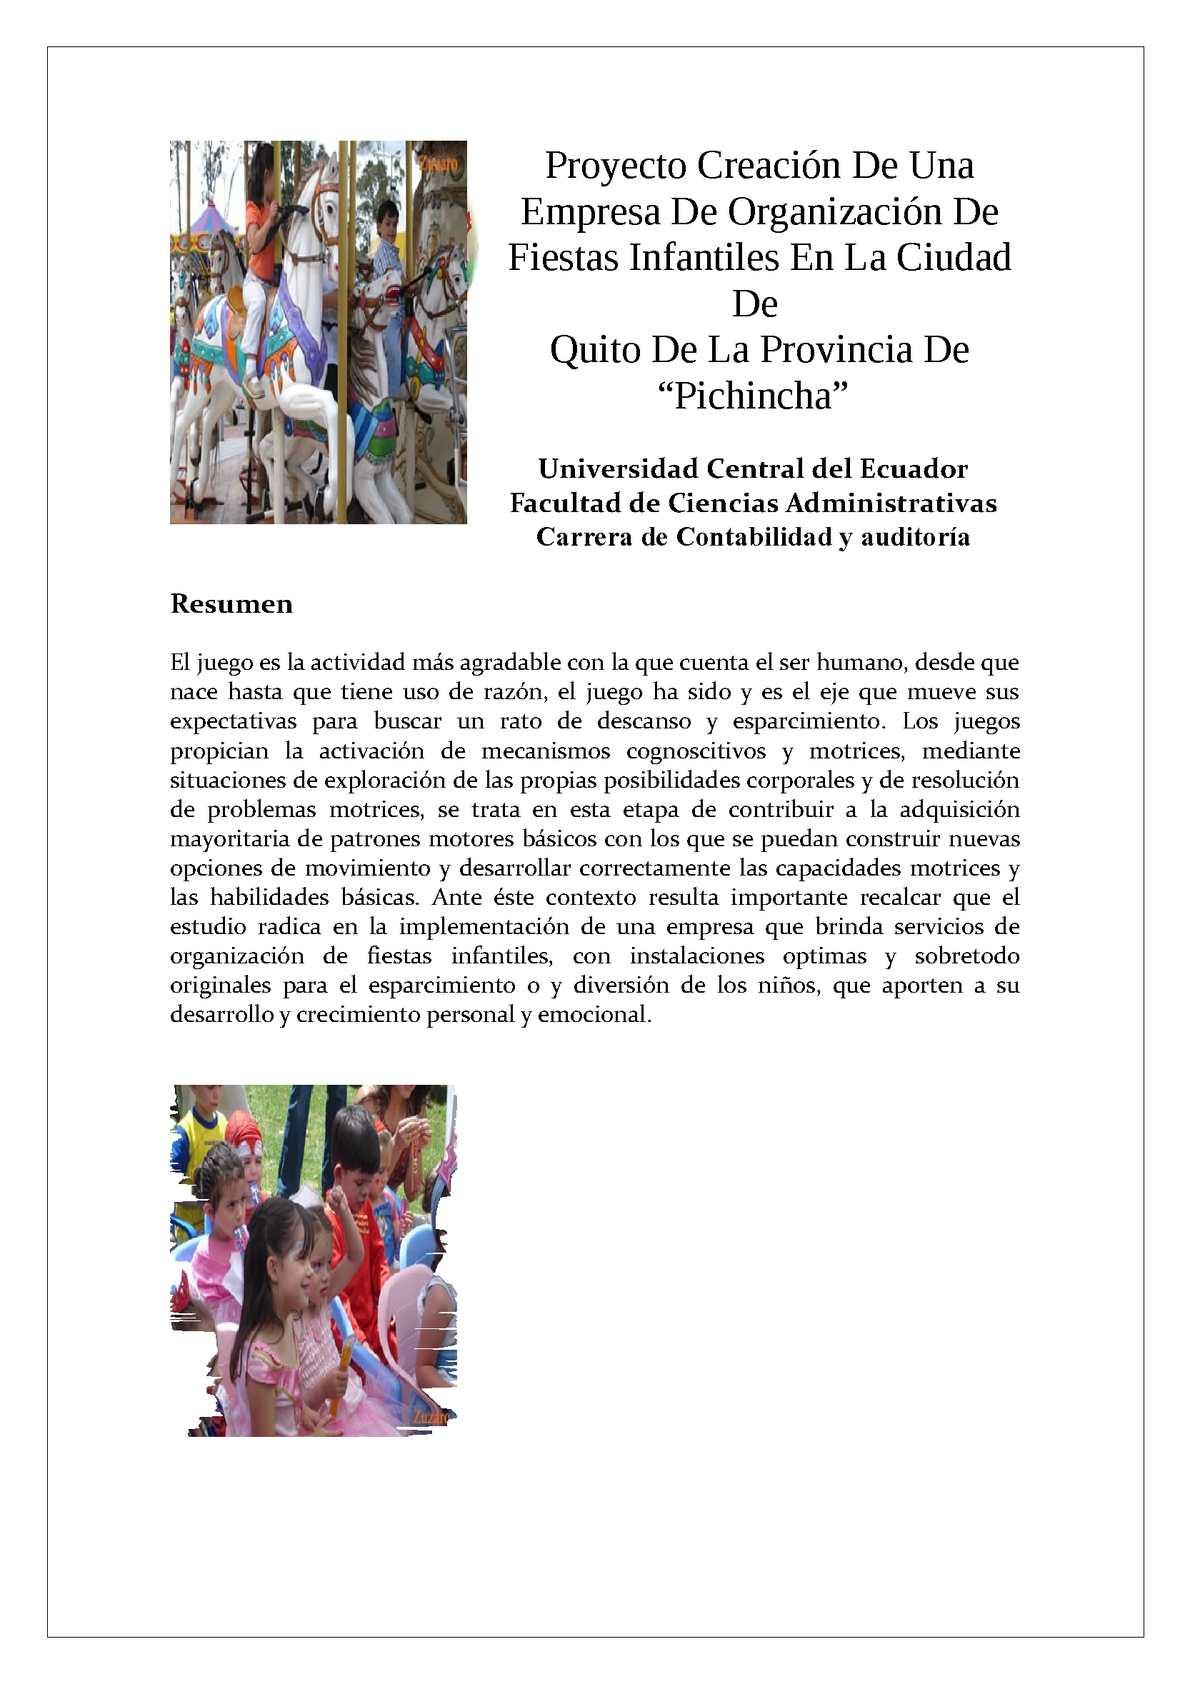 Calaméo - Proyecto Creación de una Empresa Organizadora de Fiestas ...